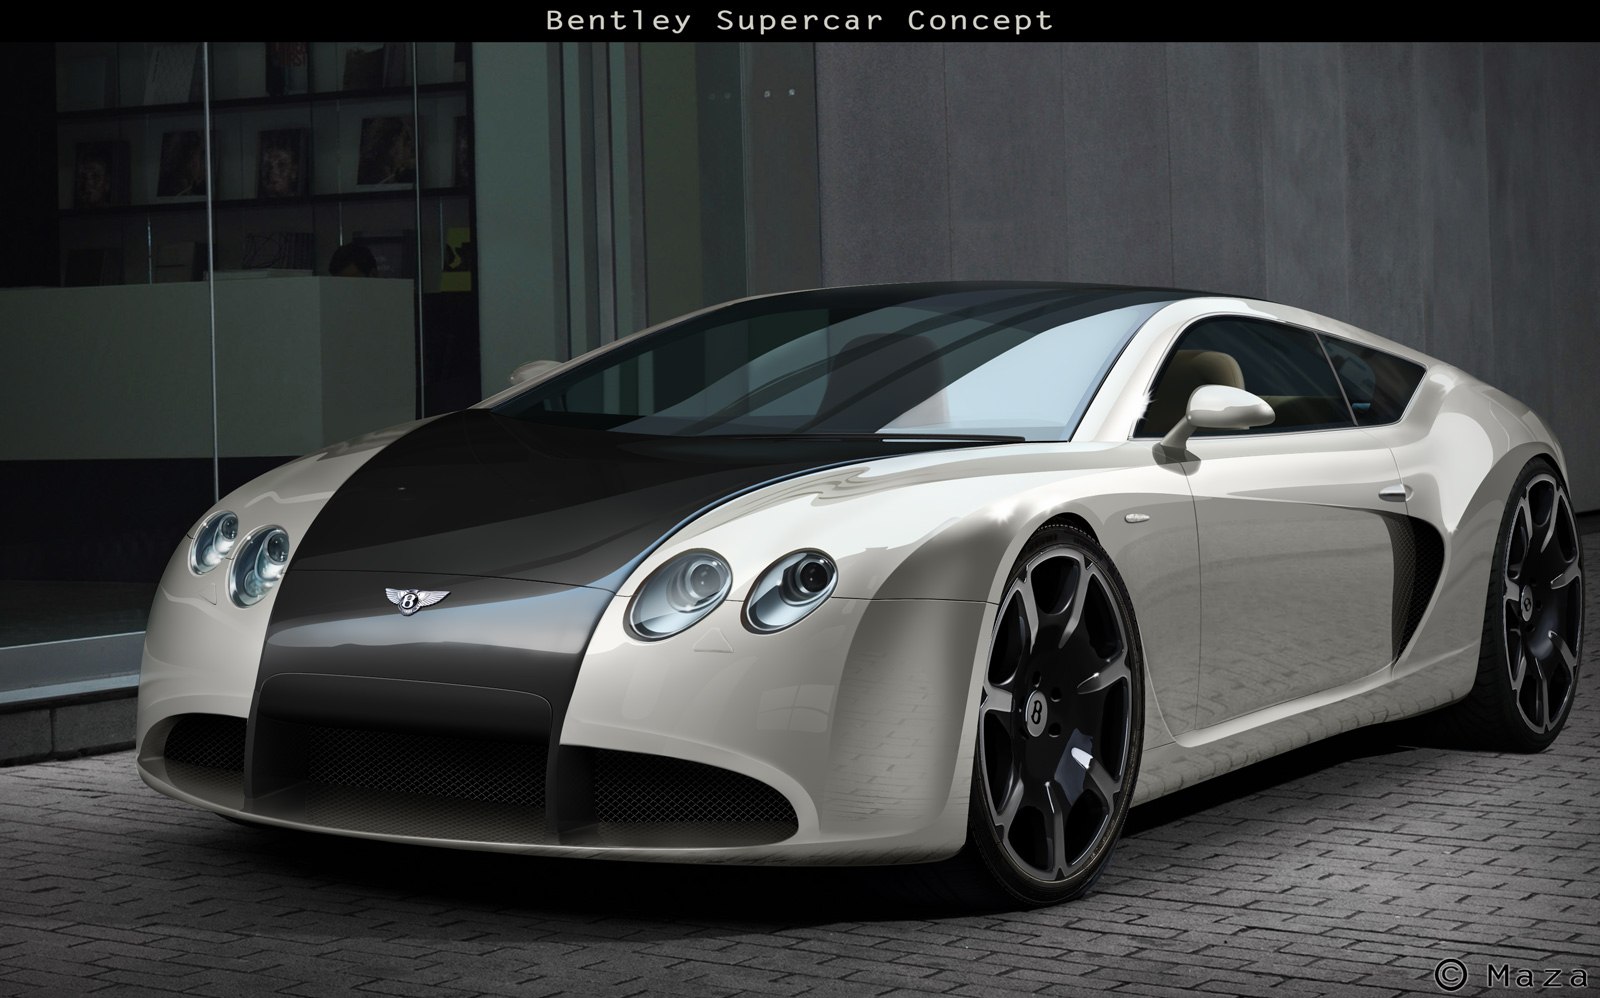 maza u0026 39 s profile  u203a autemo com  u203a automotive design studio